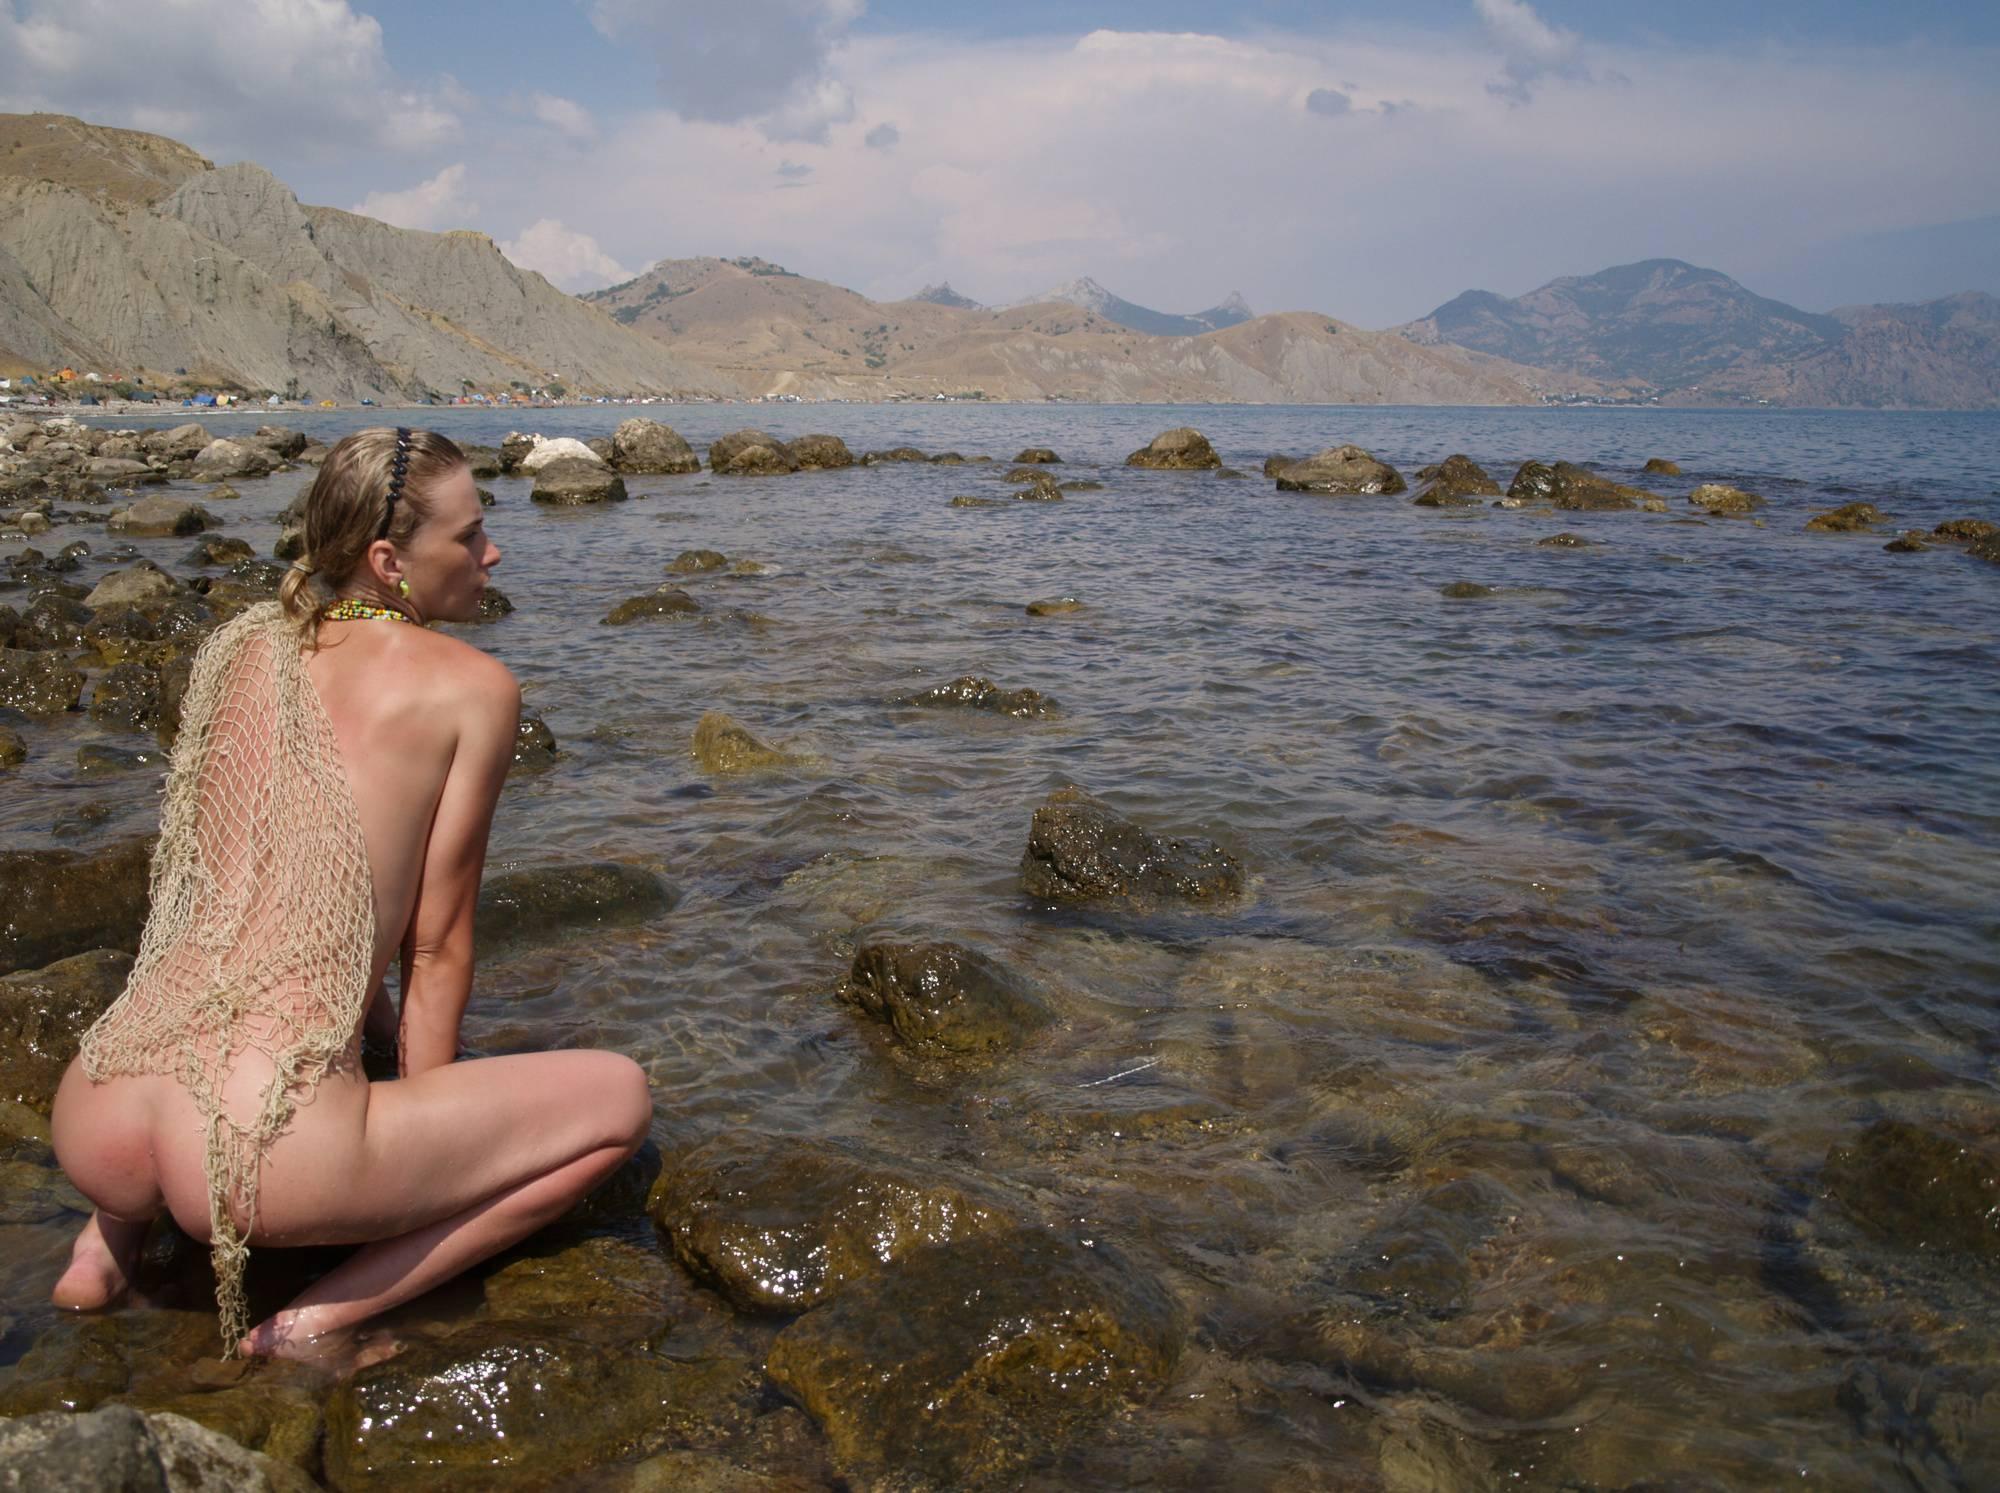 Nudist Pics Naturist Model and Daughter - 1